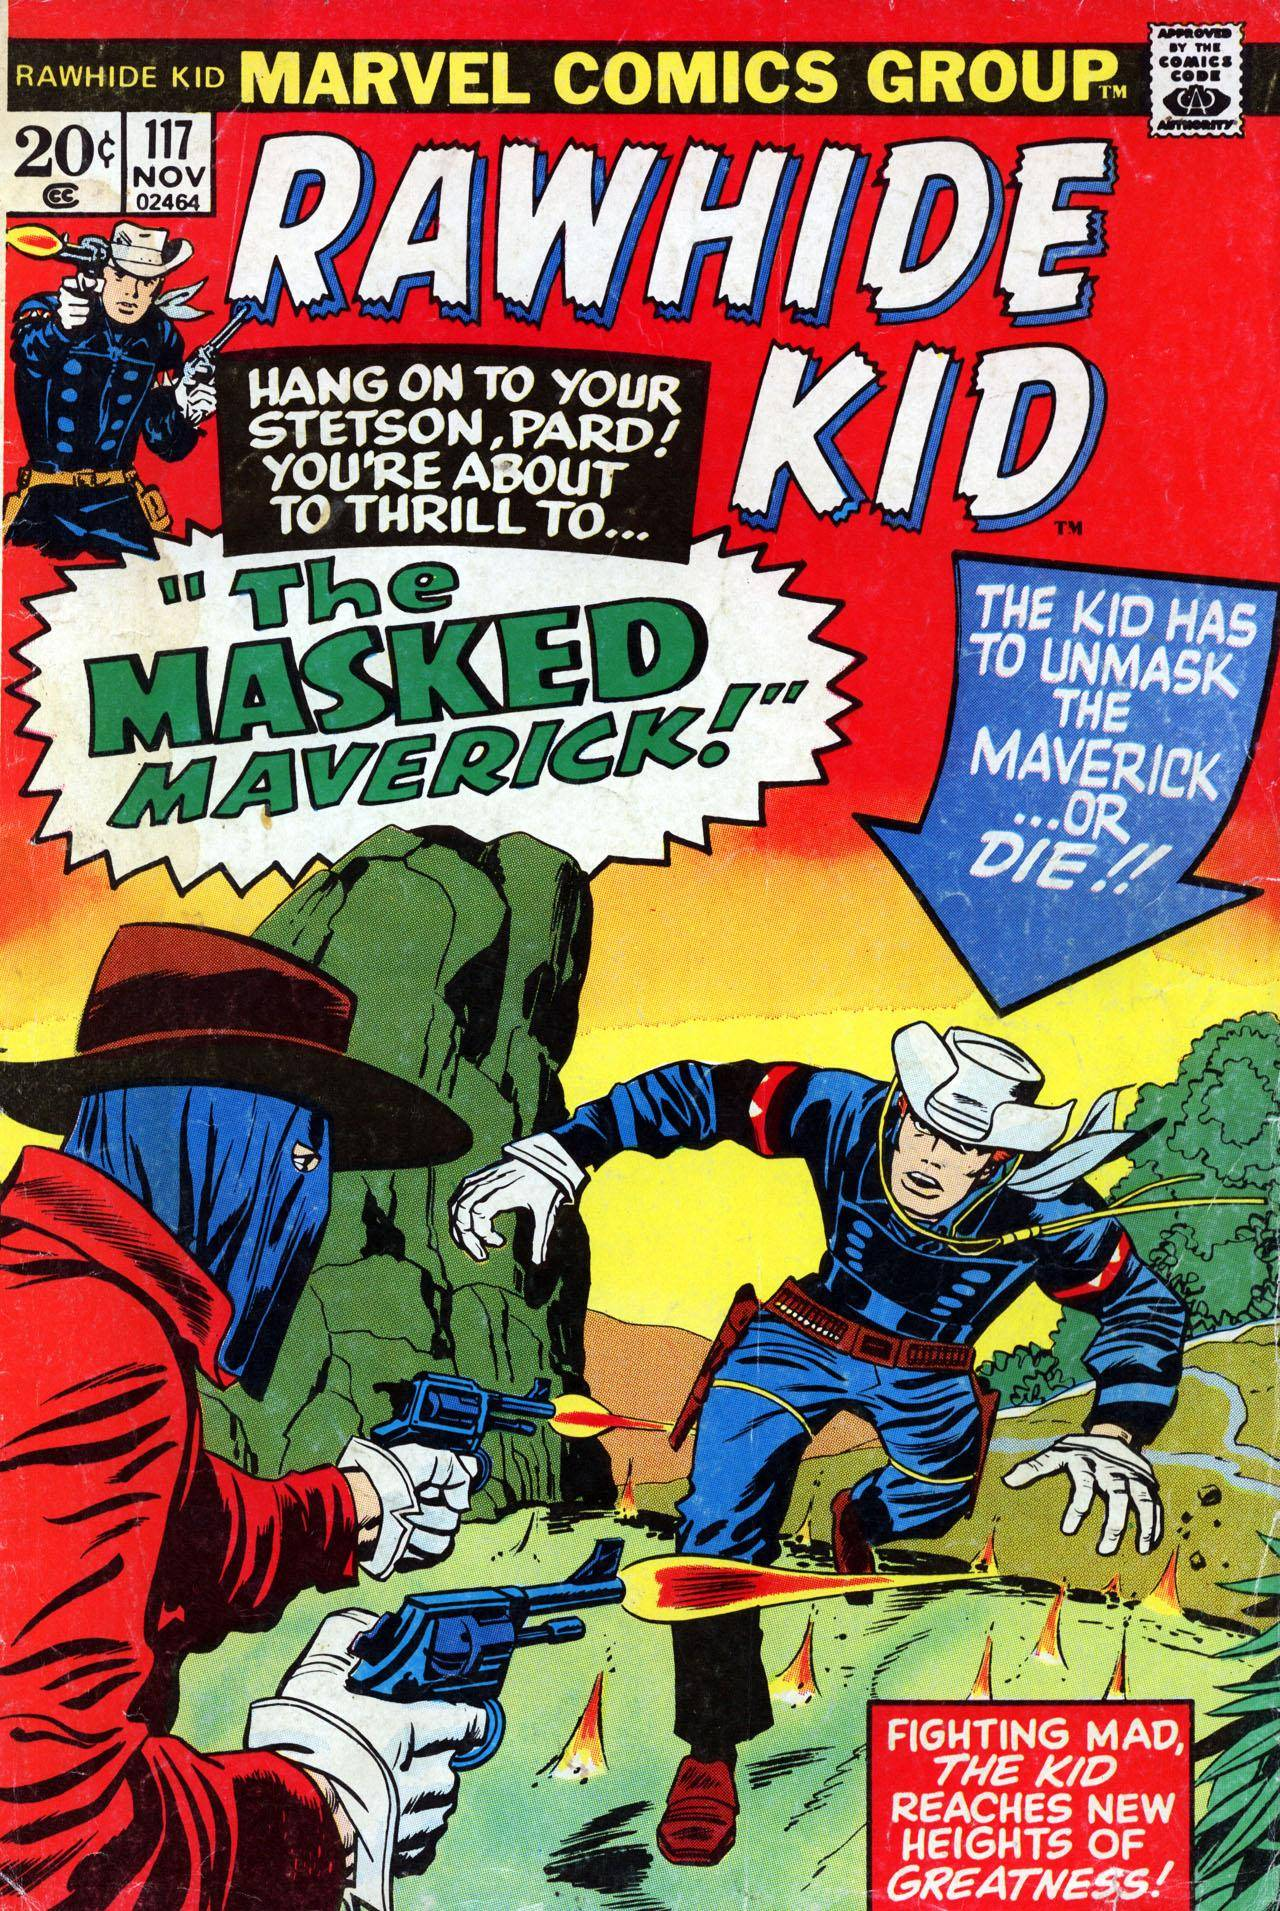 Rawhide Kid v1 117 1973 Gambit